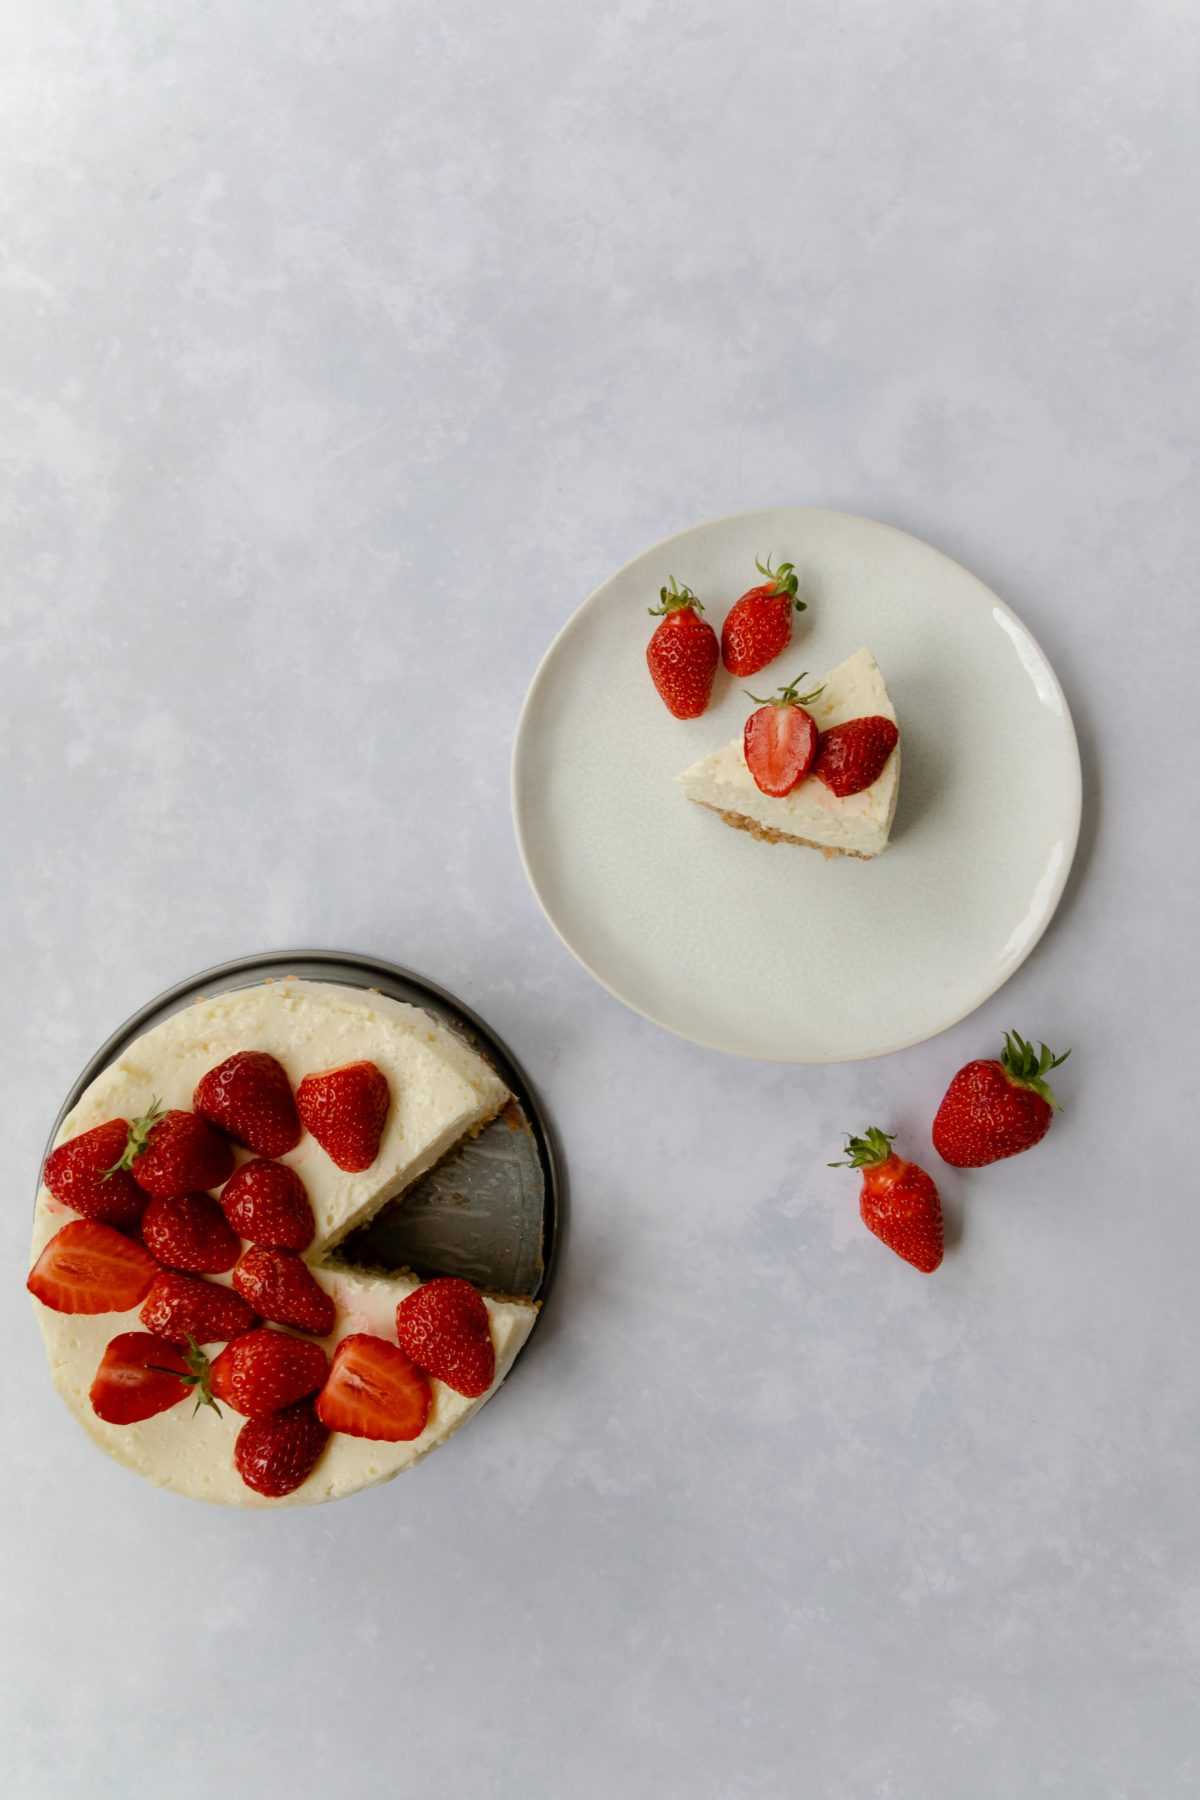 American Cheesecake mit Erdbeeren // American Cheescake with strawberries by https://babyrockmyday.com/american-cheesecake-mit-erdbeeren/